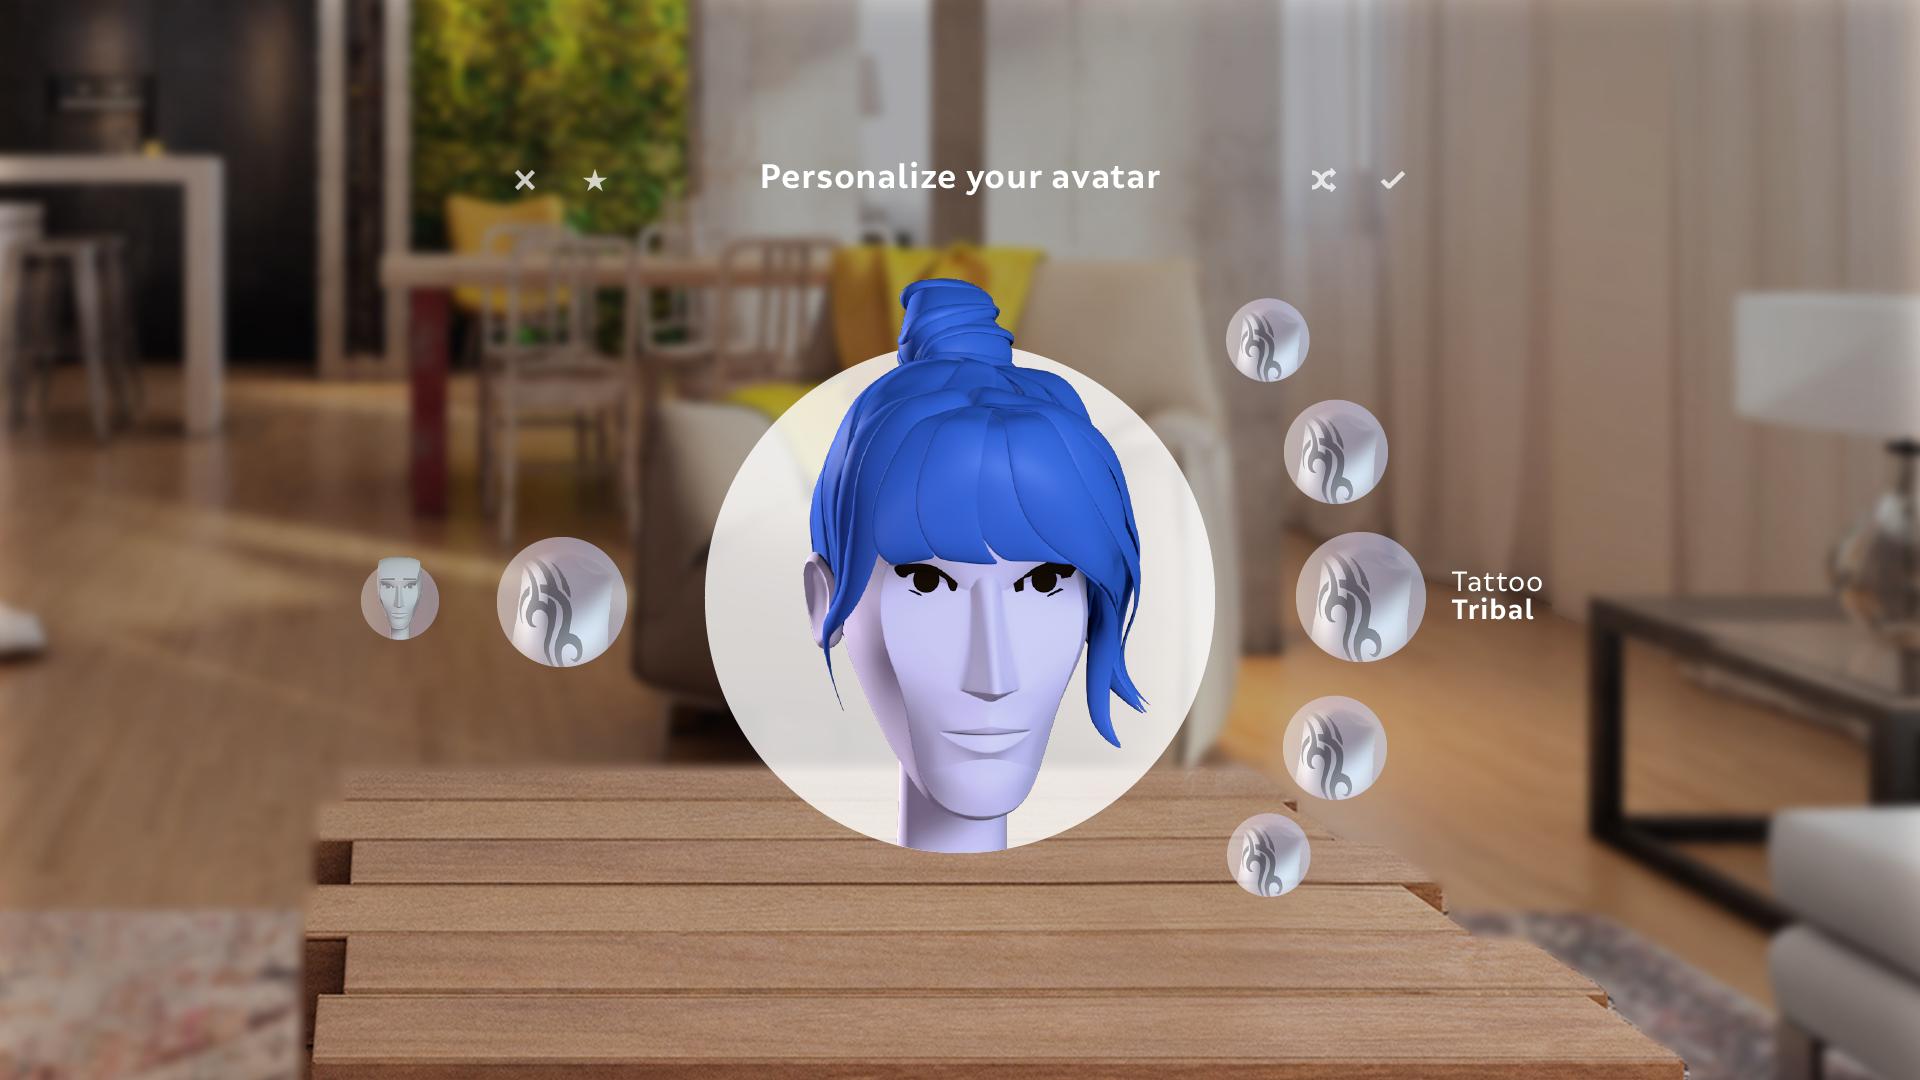 Avatar Personalization Rig | Magic Leap